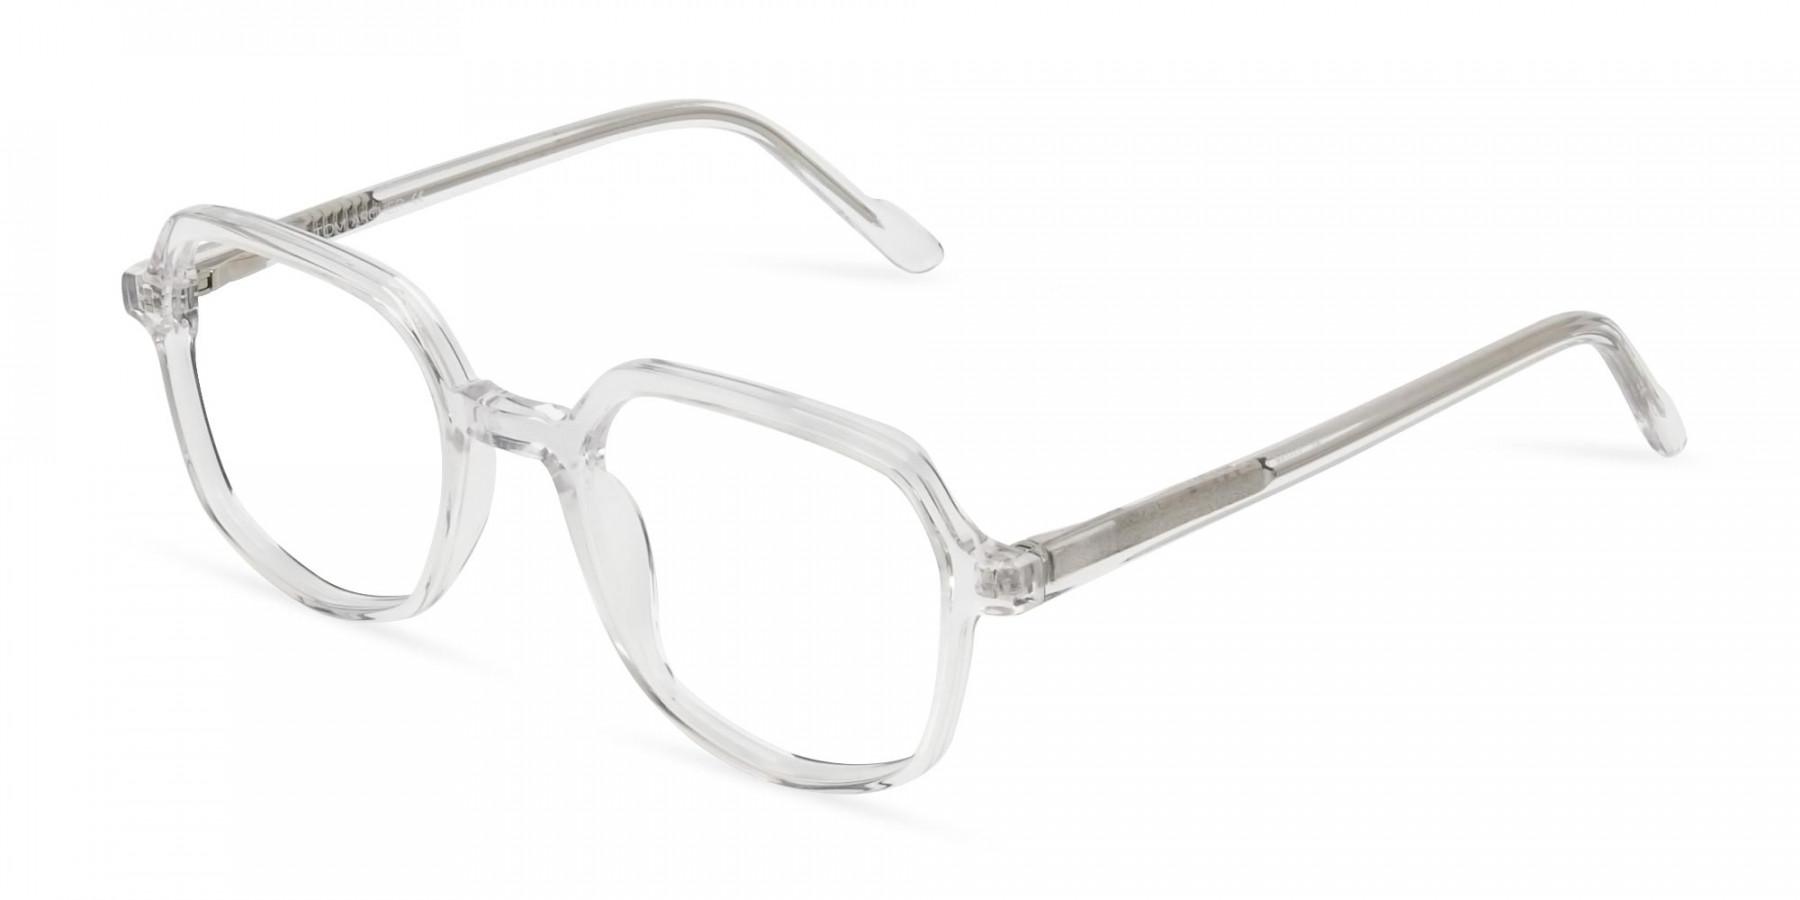 Transparent Geometric Heptagon Glasses - 1